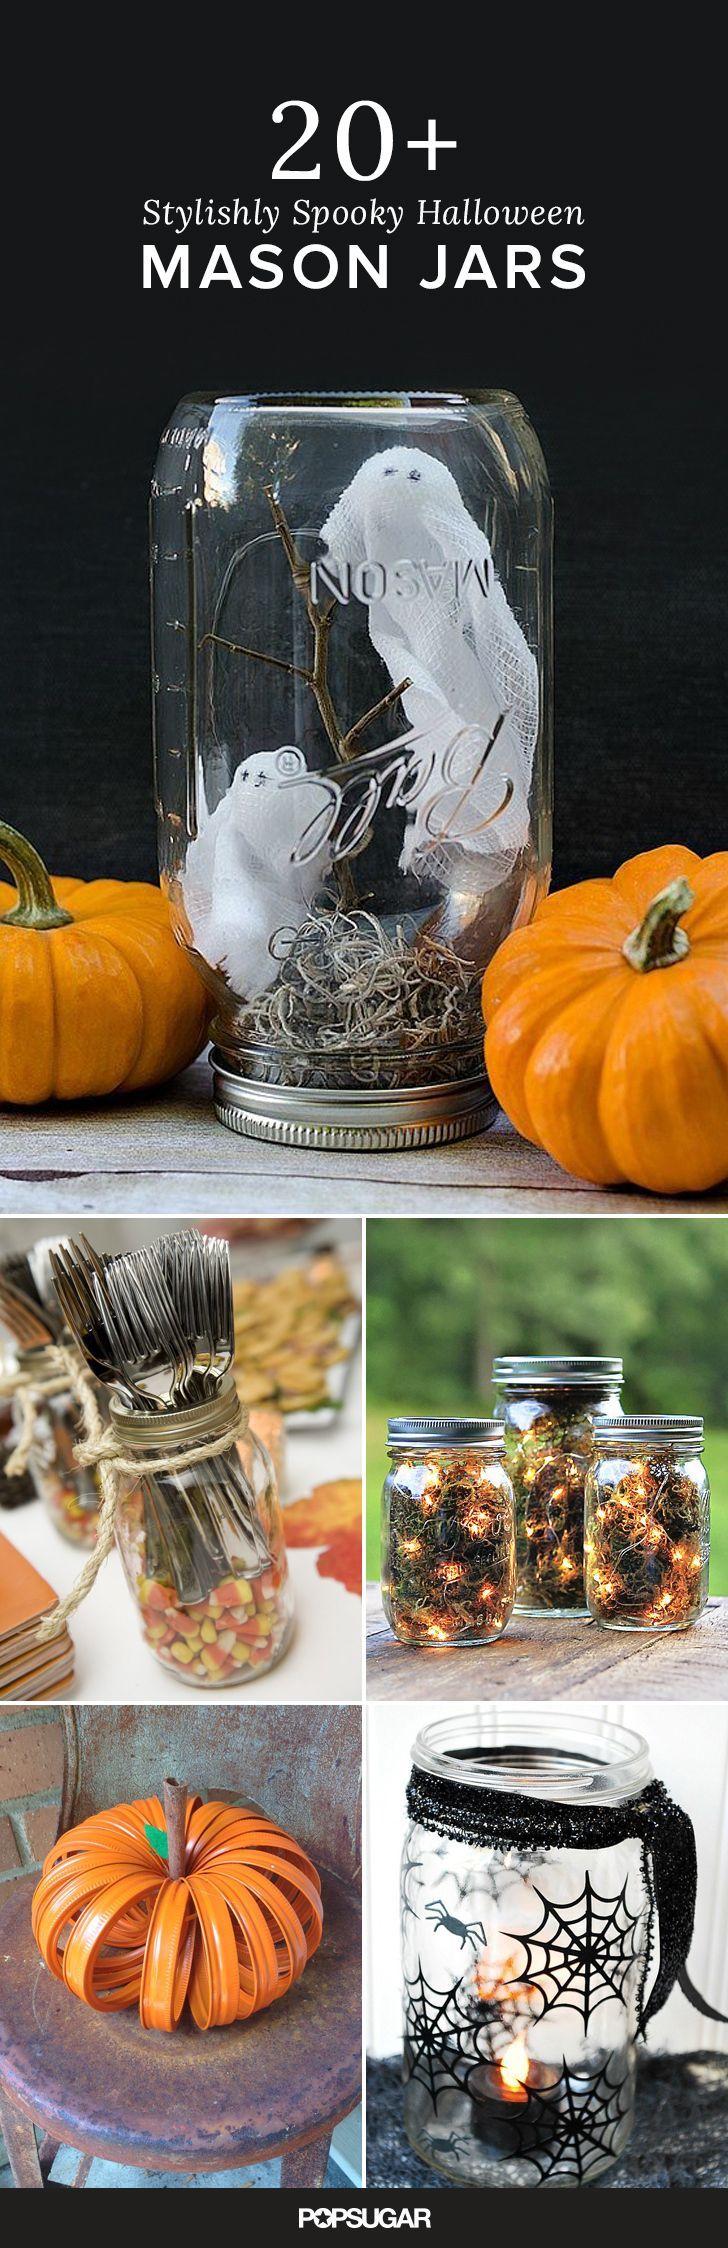 159 best Halloween Ideas images on Pinterest